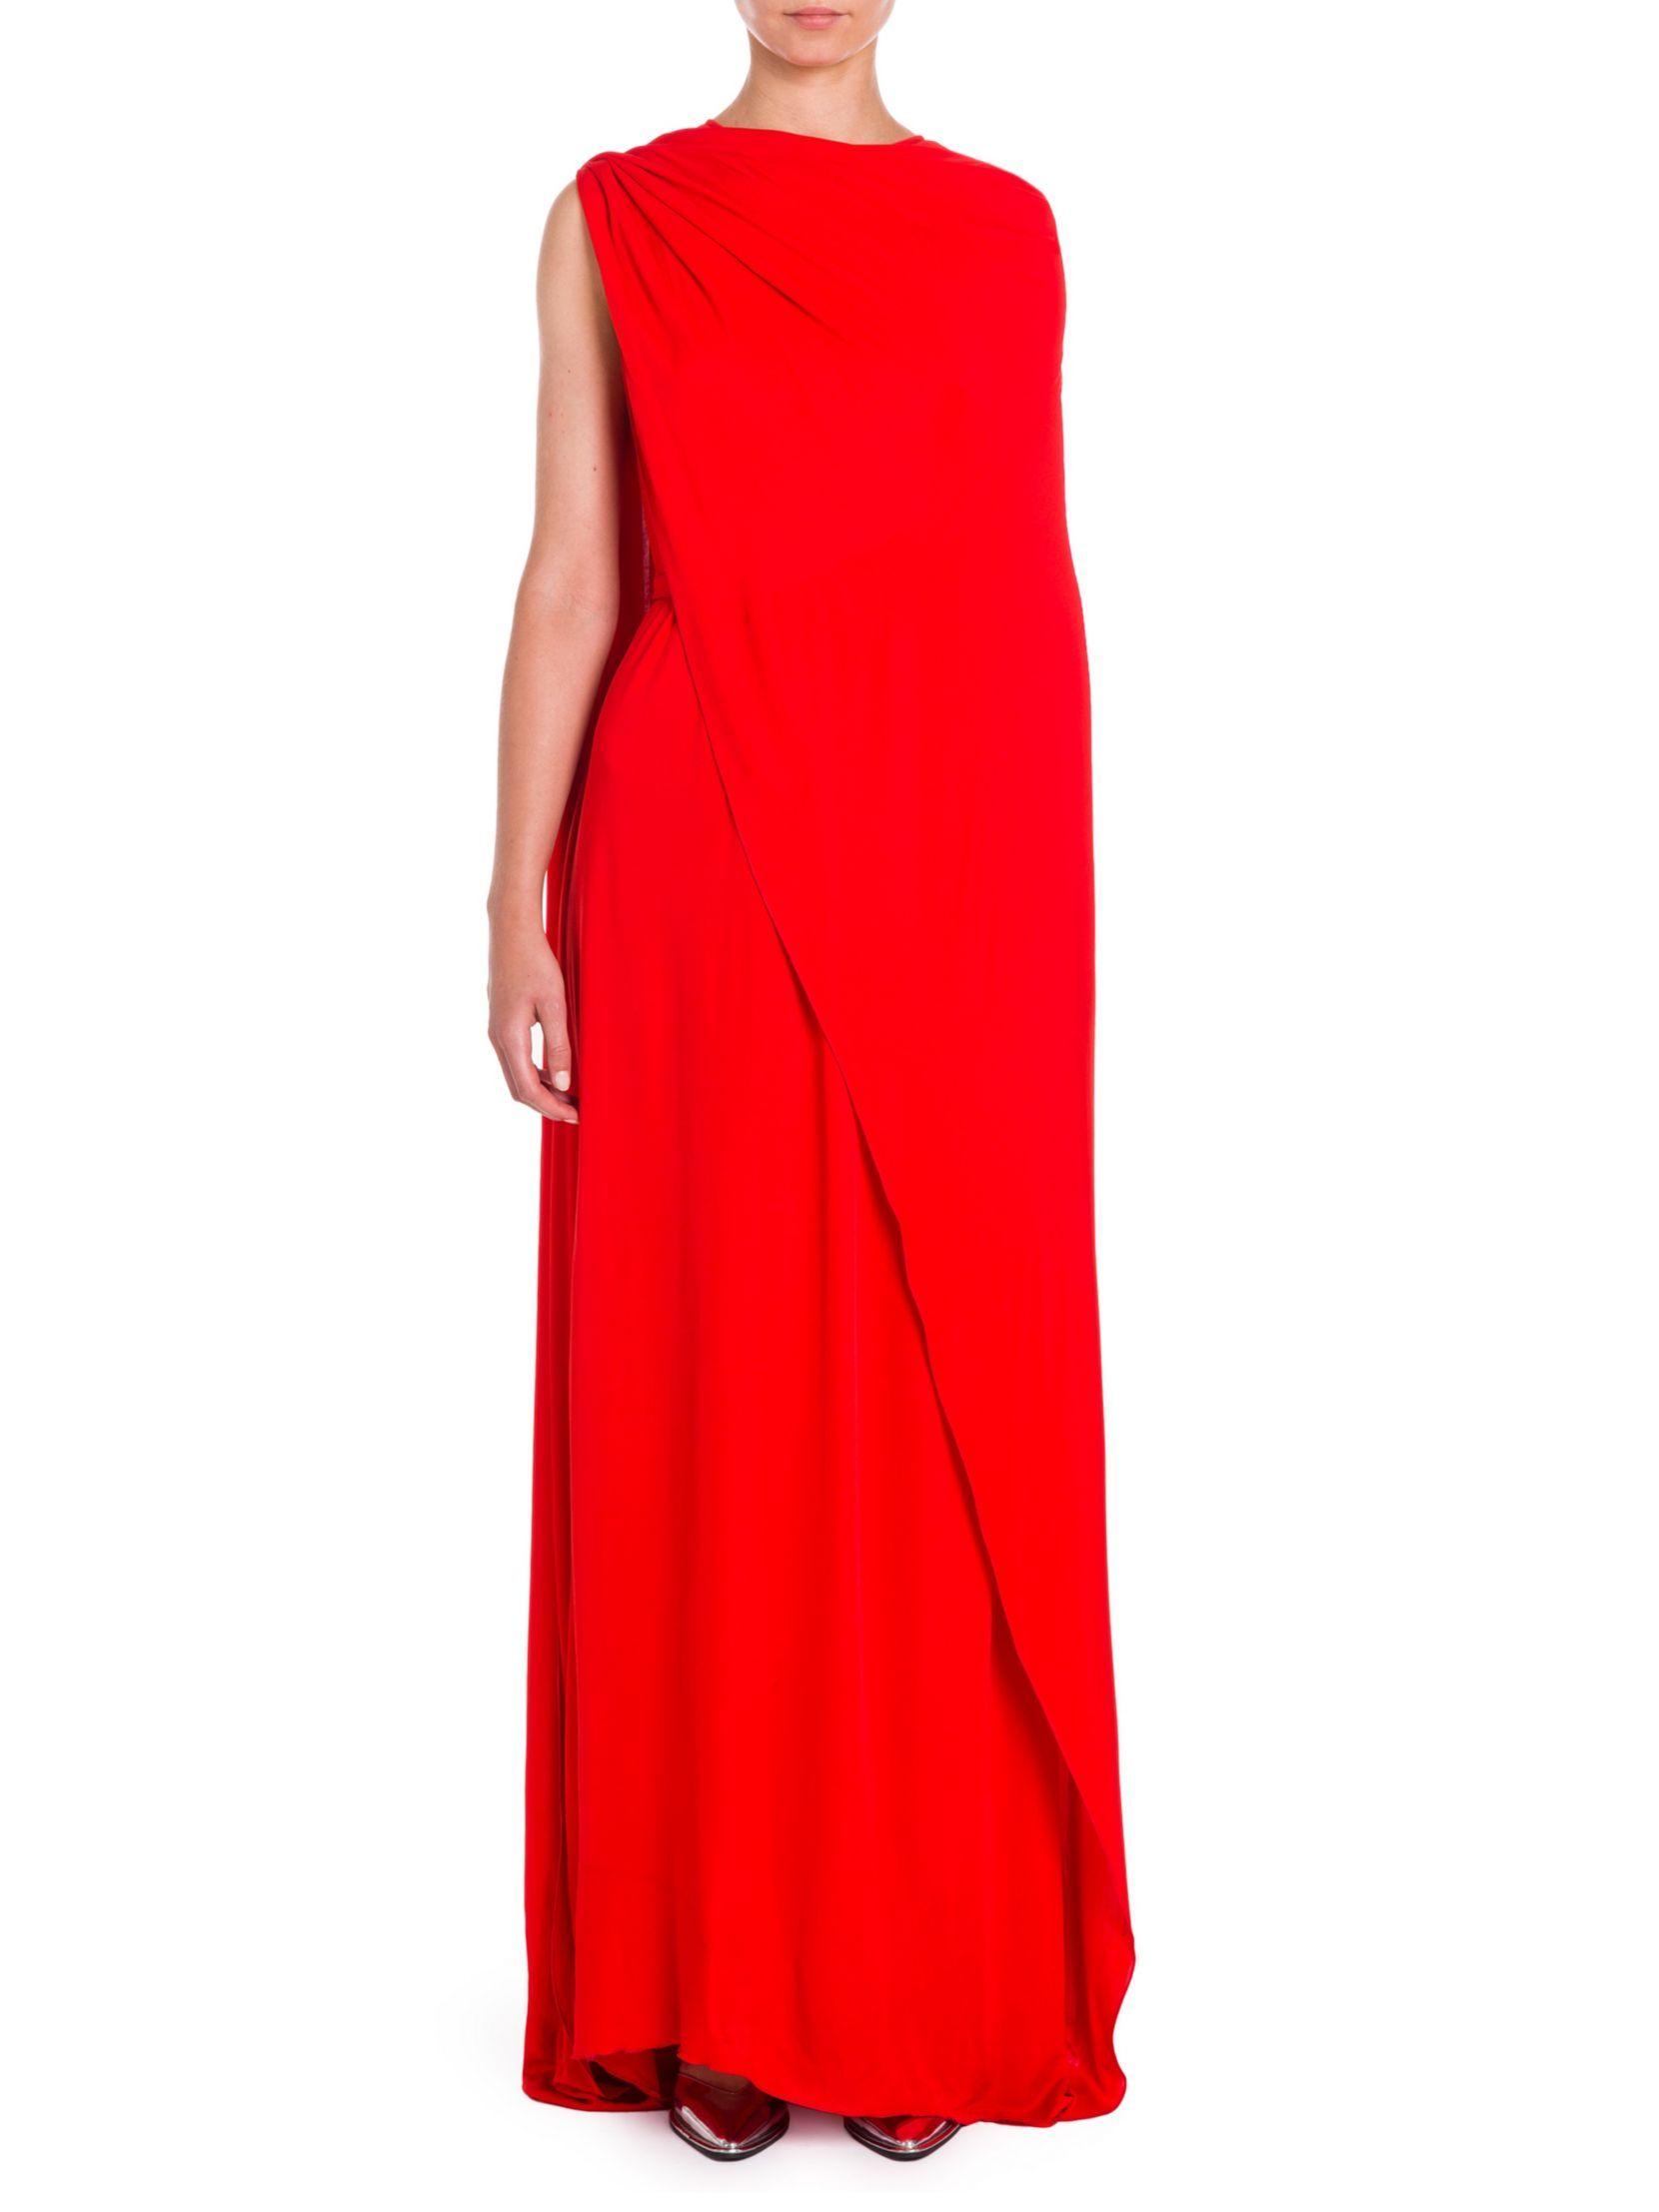 Stella mccartney convertible cape gown dresses pinterest